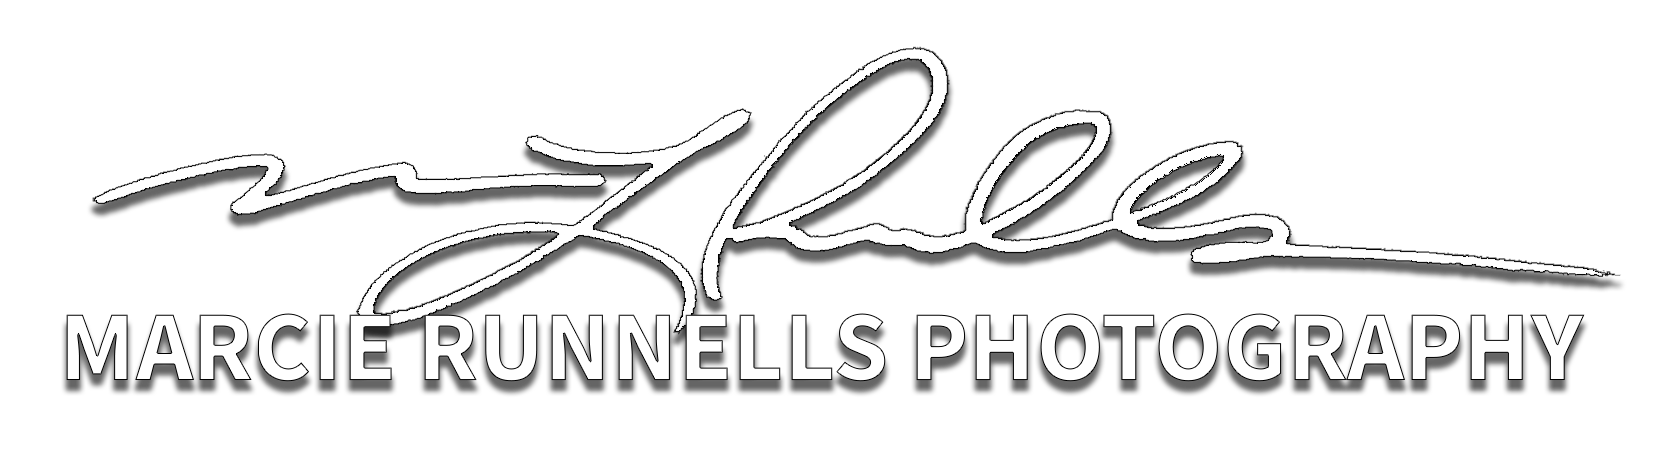 Marcie Runnells Photography